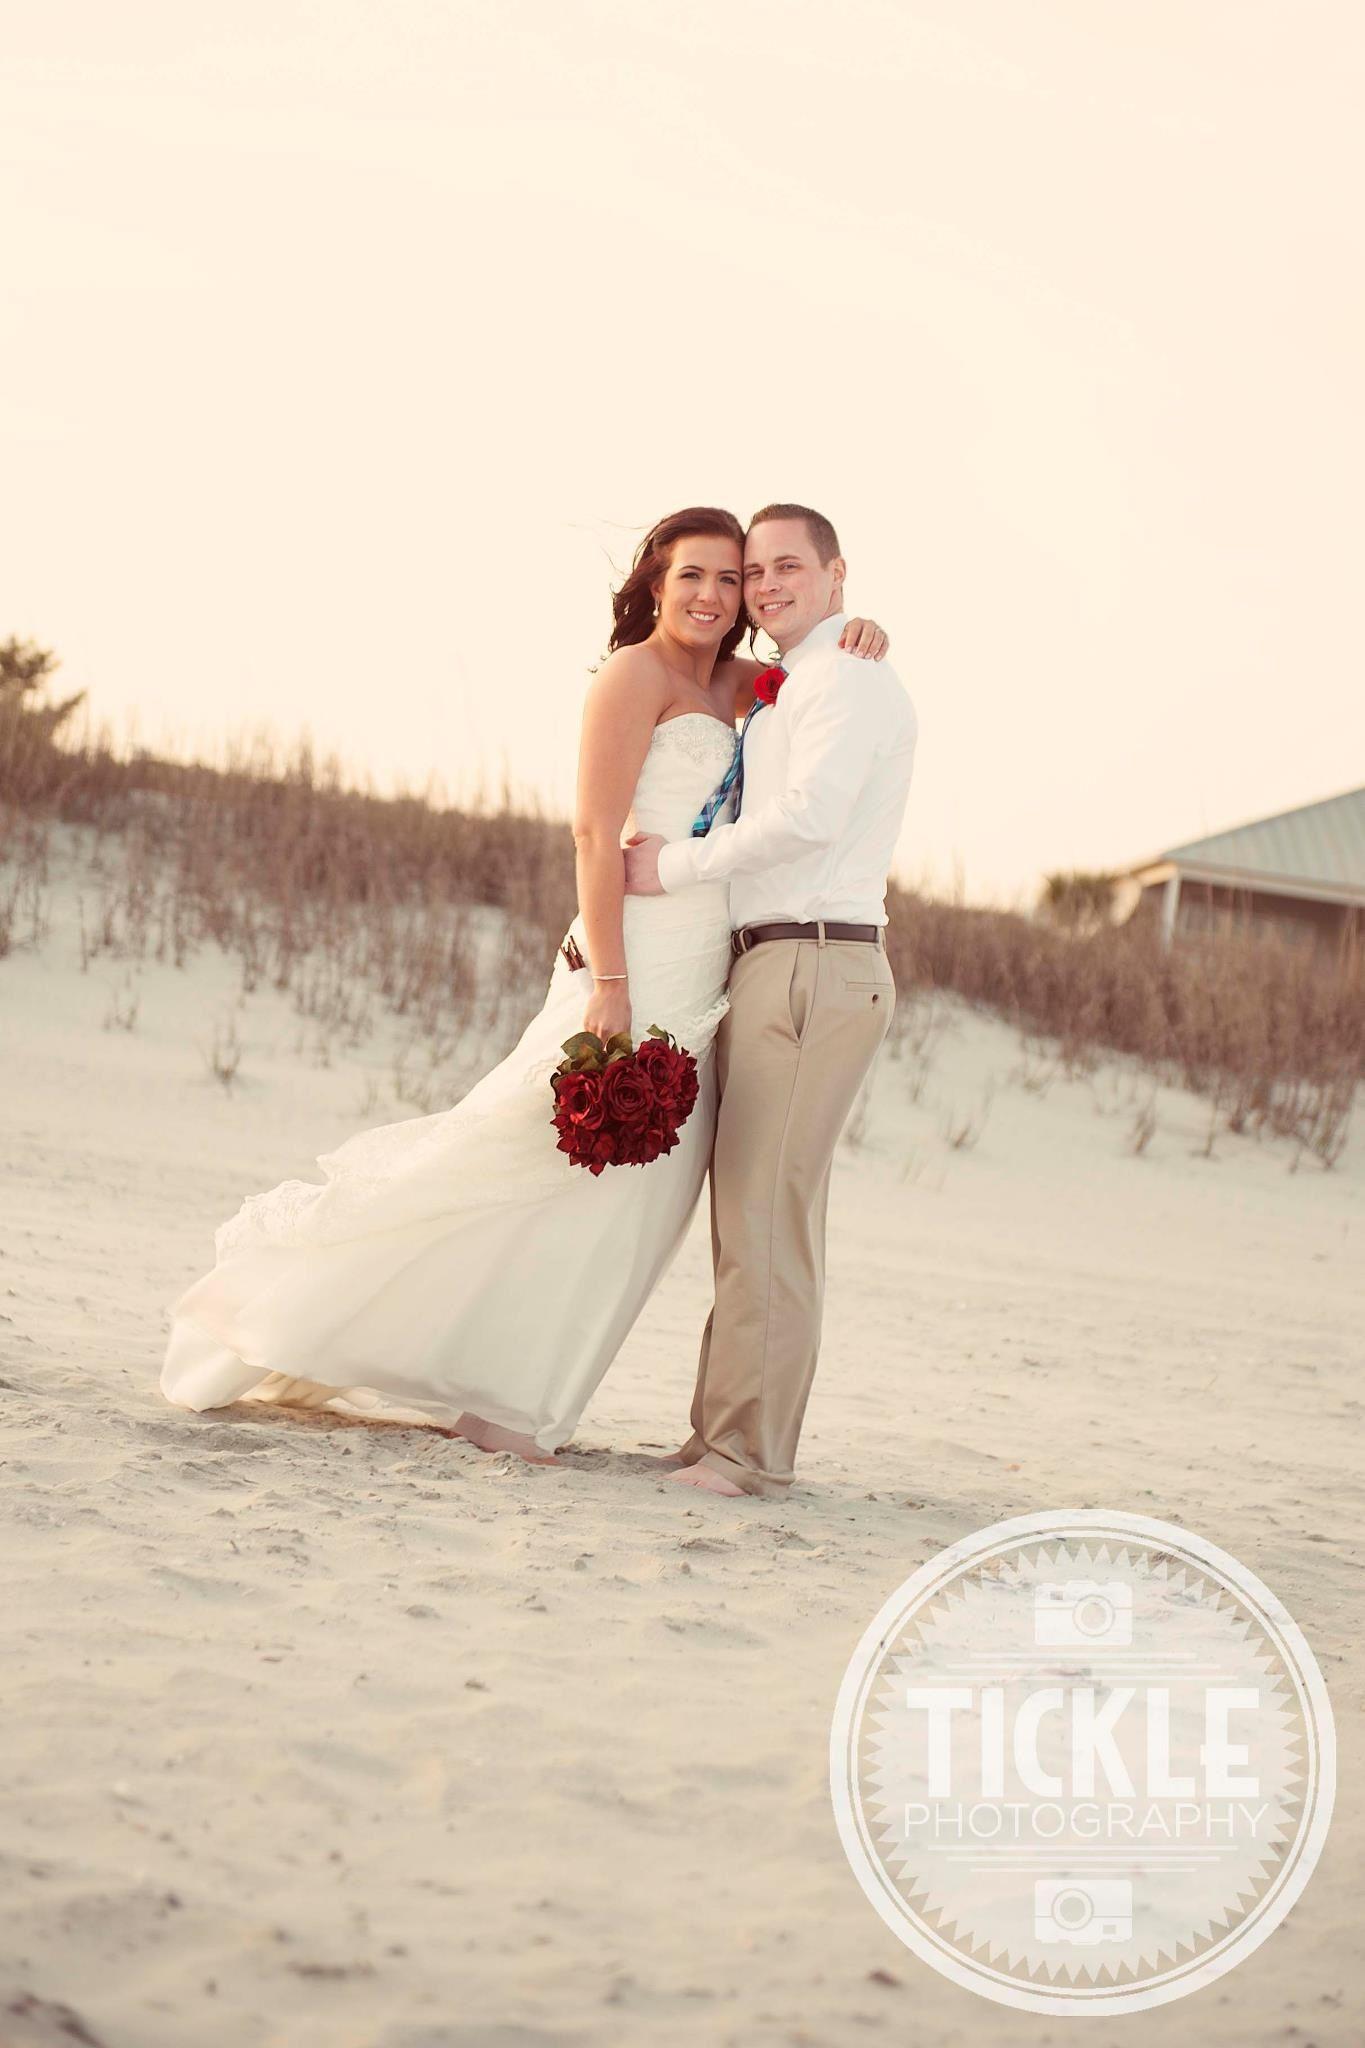 Love Beach Wedding Cherry Grove Sc North Myrtle Beach Tickle Photography North Myrtle Beach Myrtle Beach Beach Wedding